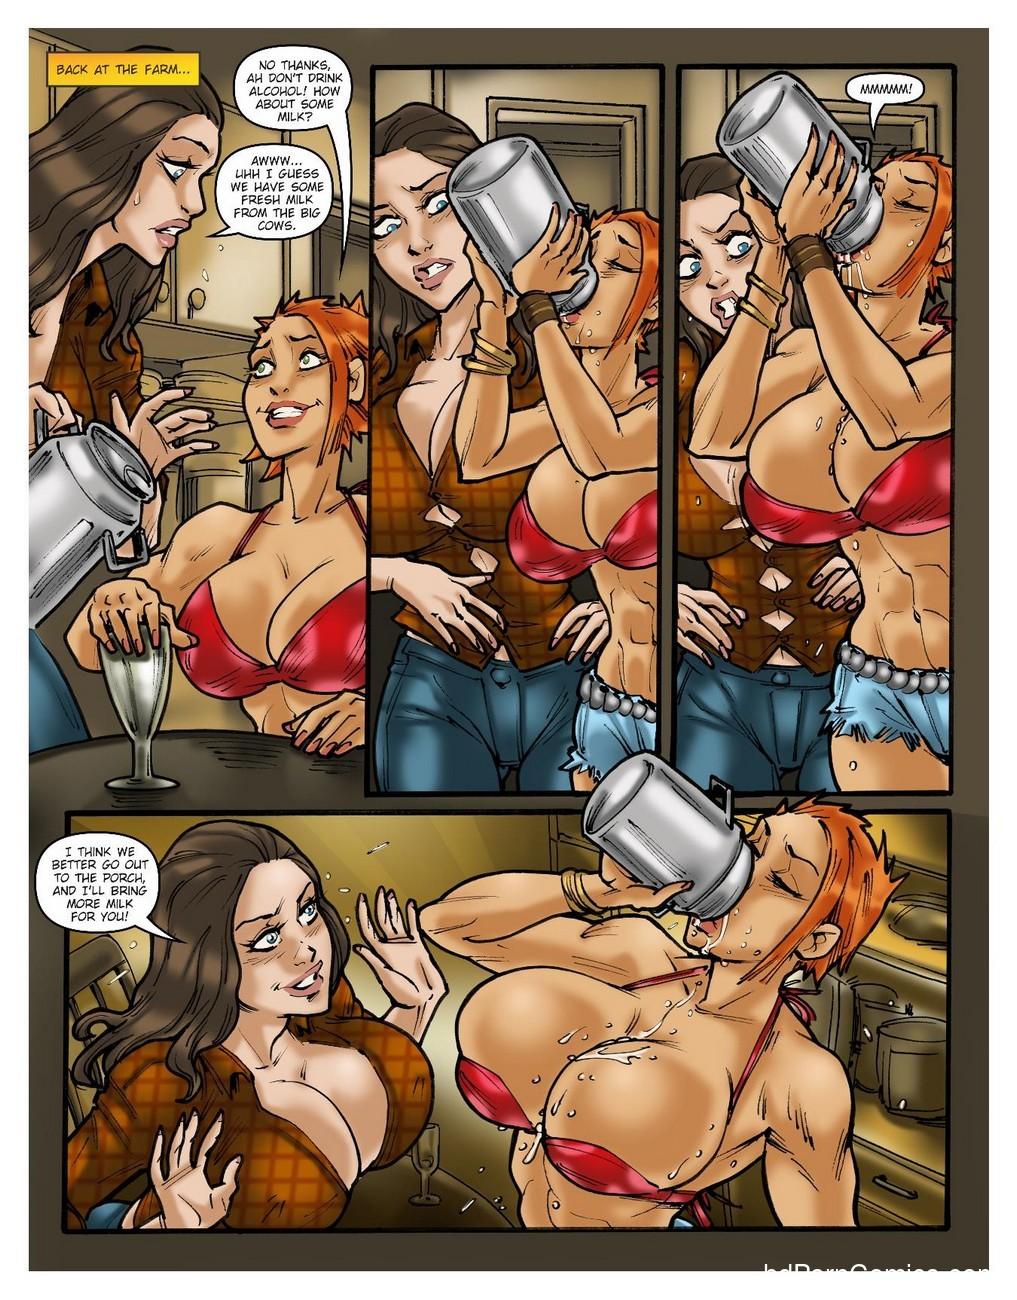 Farm Grown 2 10 free sex comic